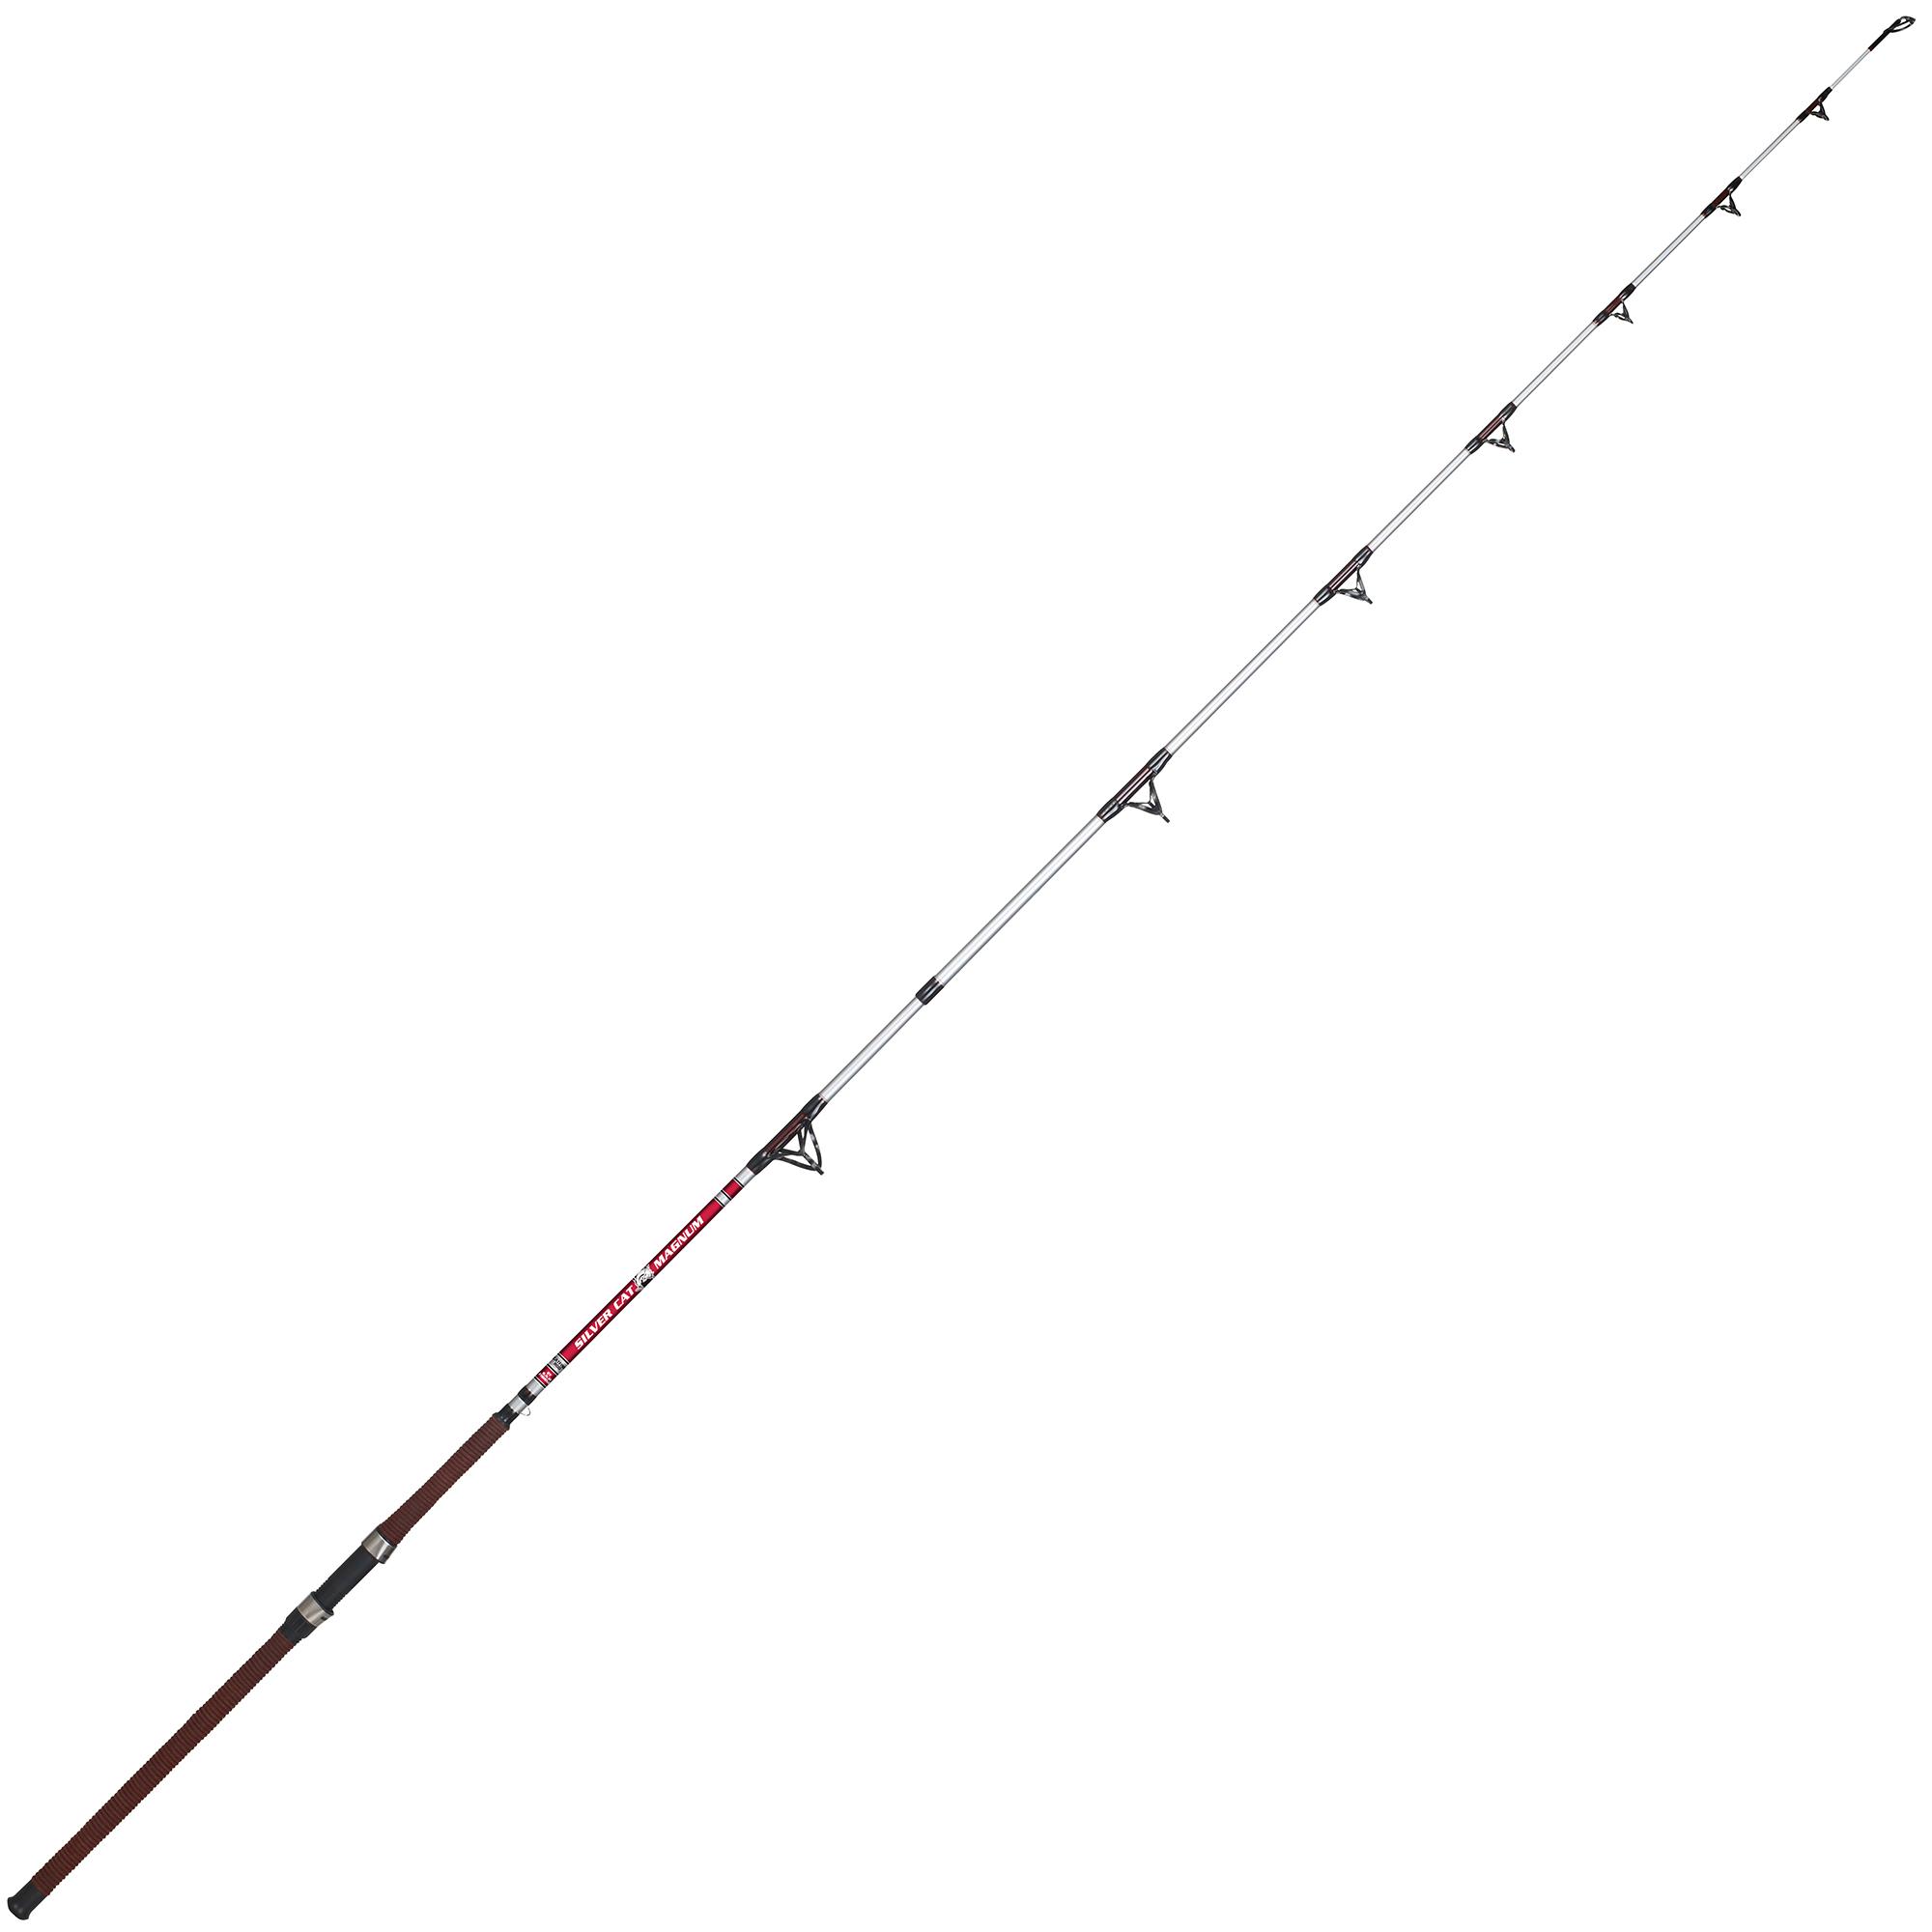 B'n'M Silver Cat Magnum Catfish Casting Rod